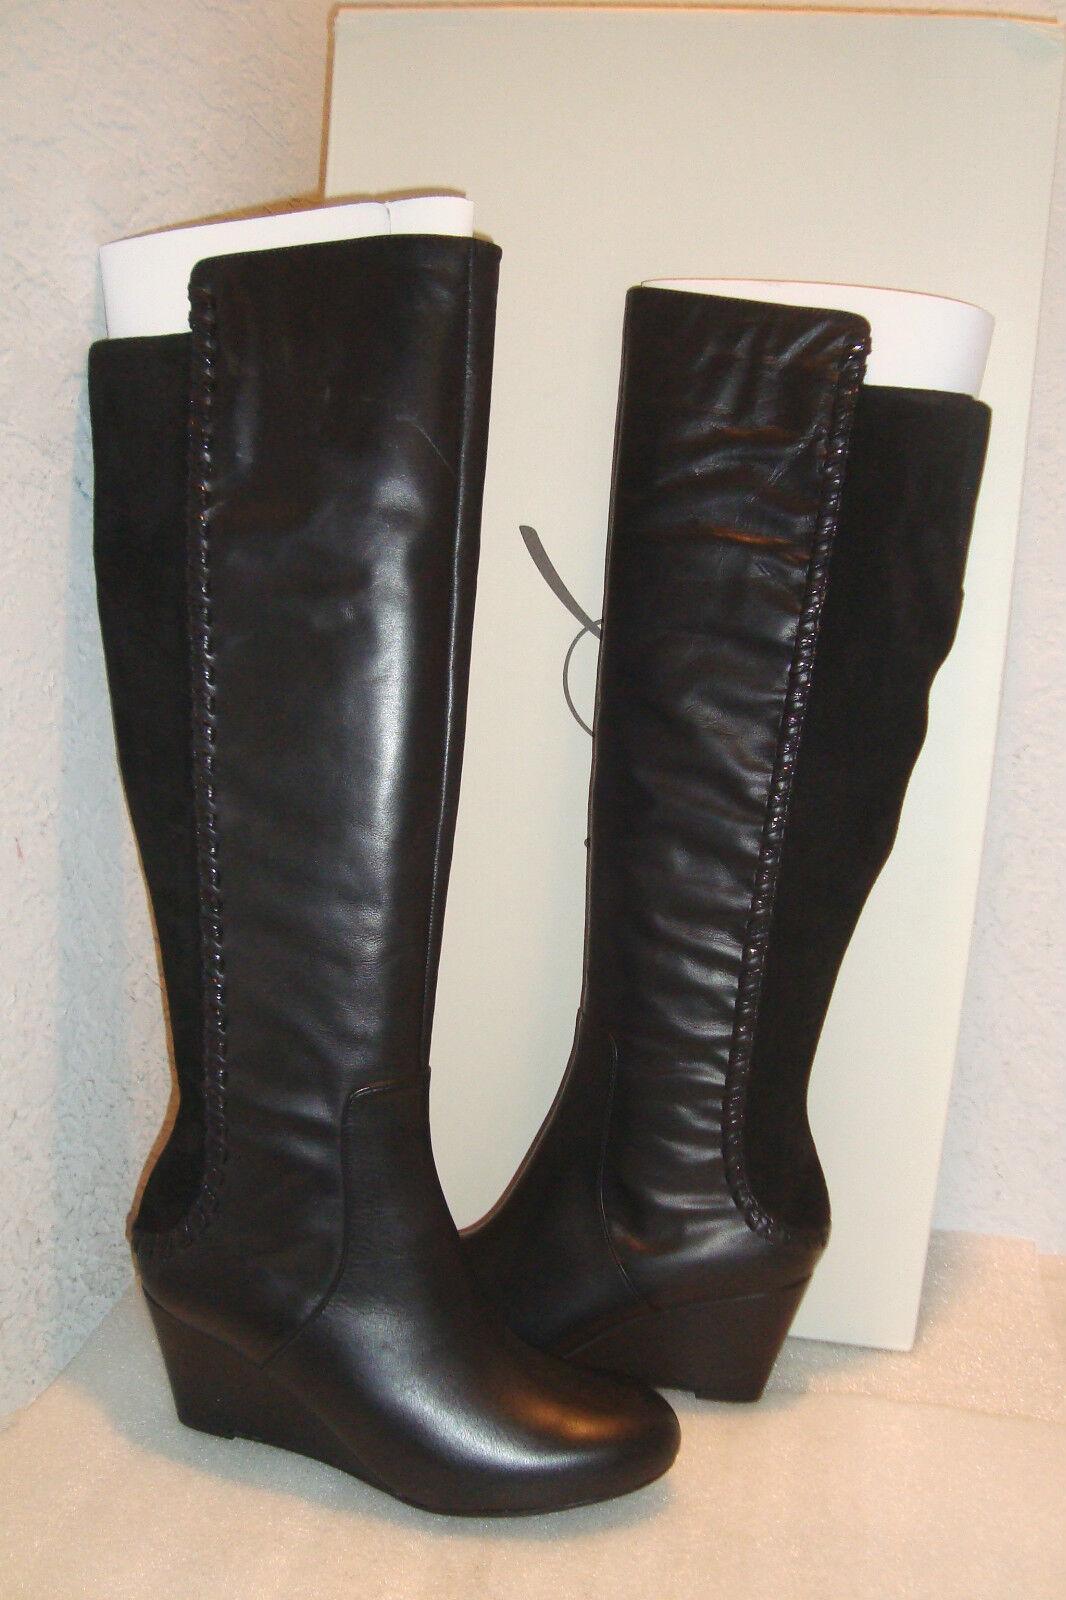 nessun minimo Rachel Roy donna NWB NWB NWB Rfrolettah nero Leather Wedge stivali scarpe 5.5 MED NEW  economico